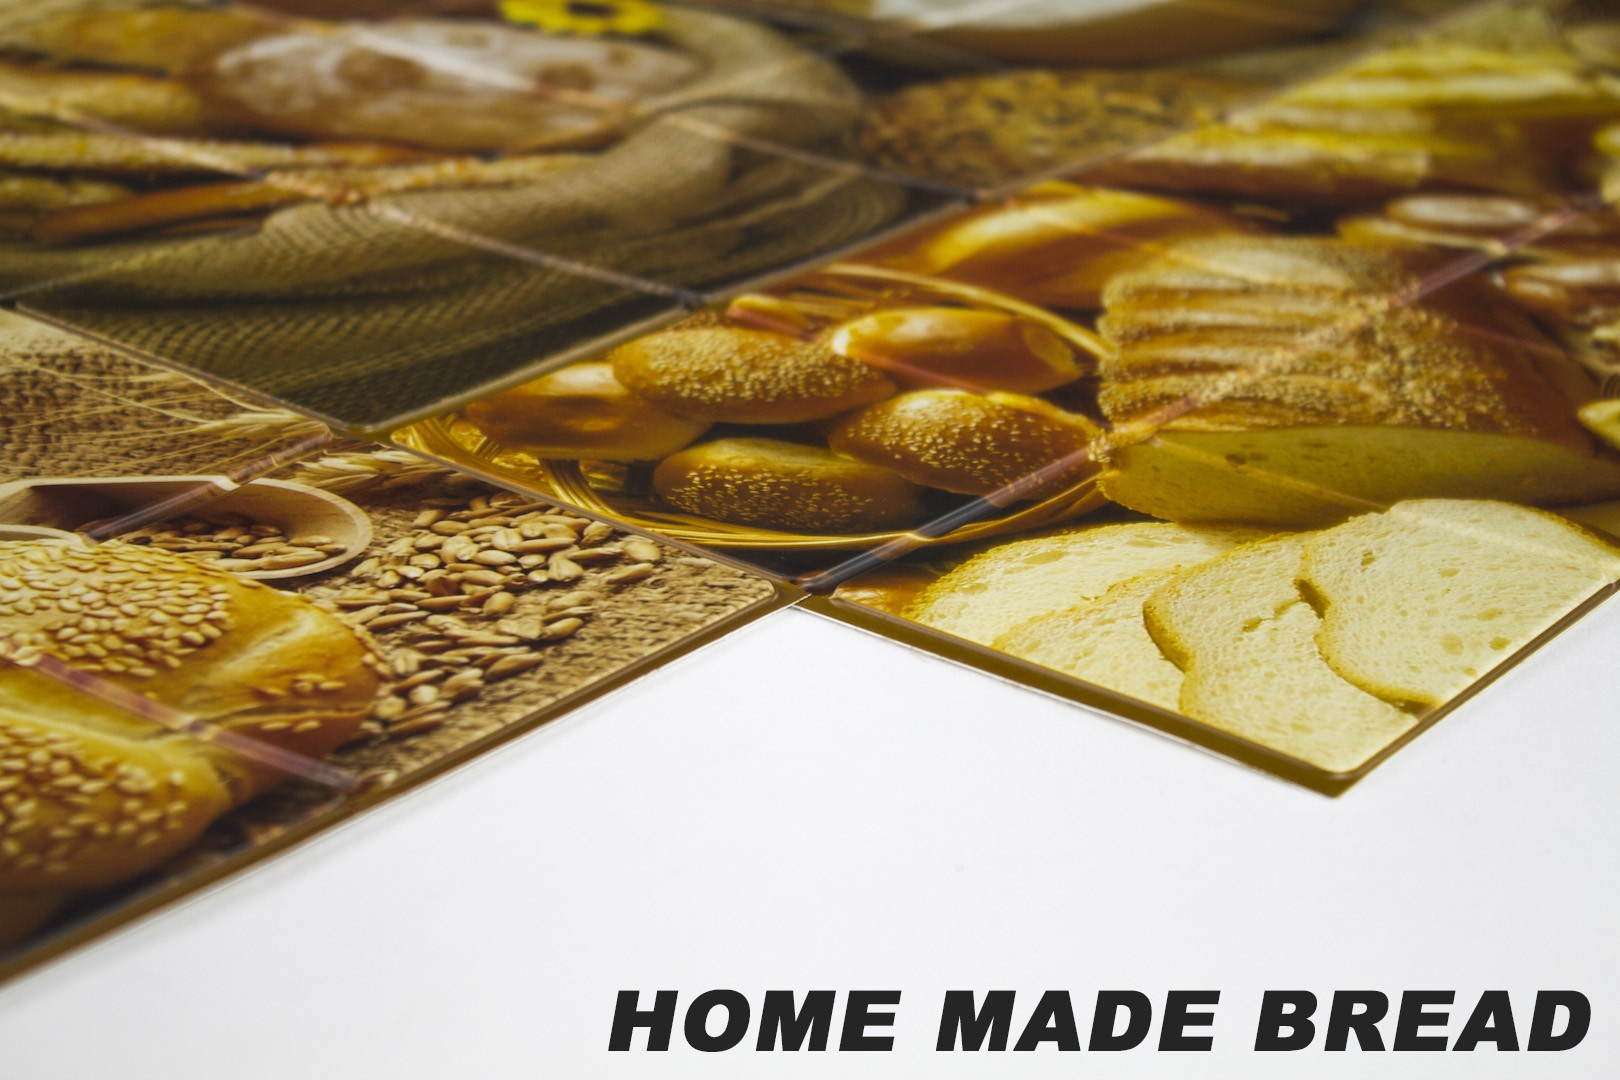 Home made bread originalbild 1